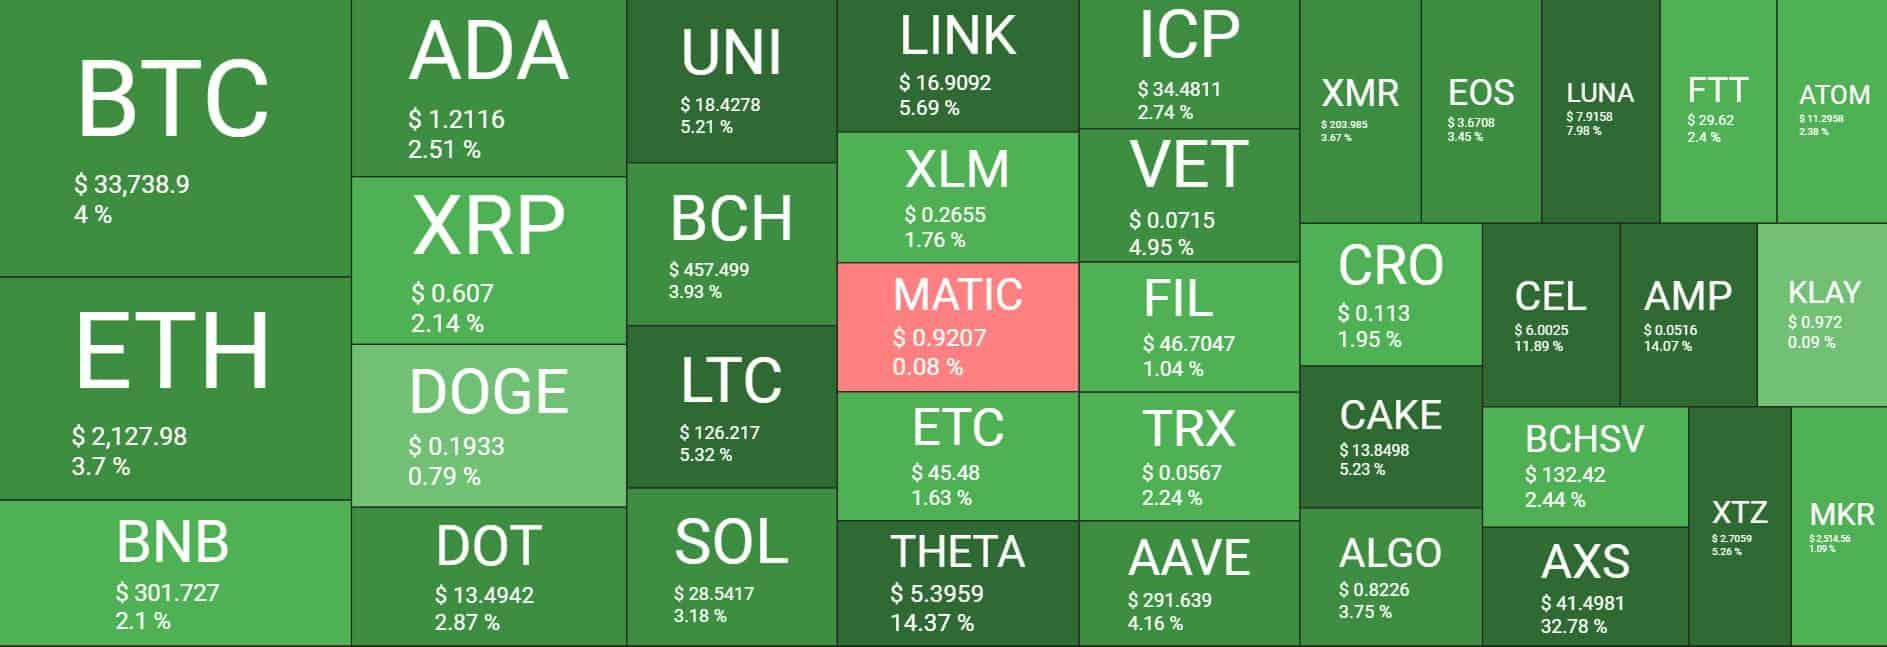 weekend btc è bitcoin una società pubblica